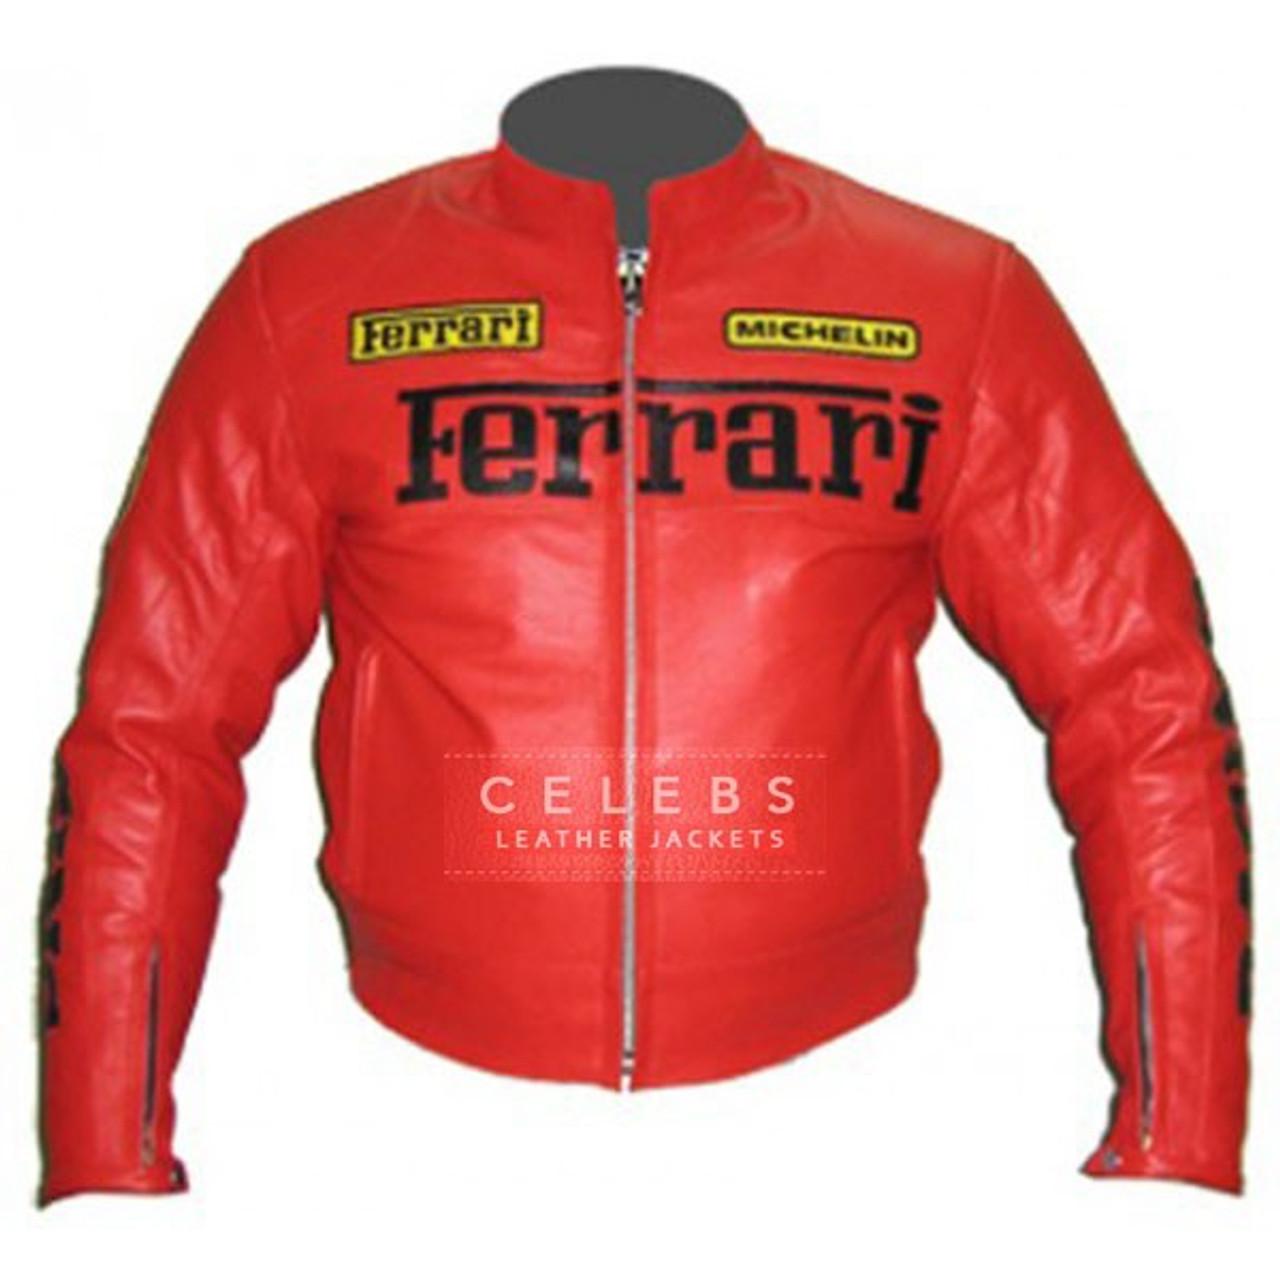 Ferrari Replica Leather Jacket